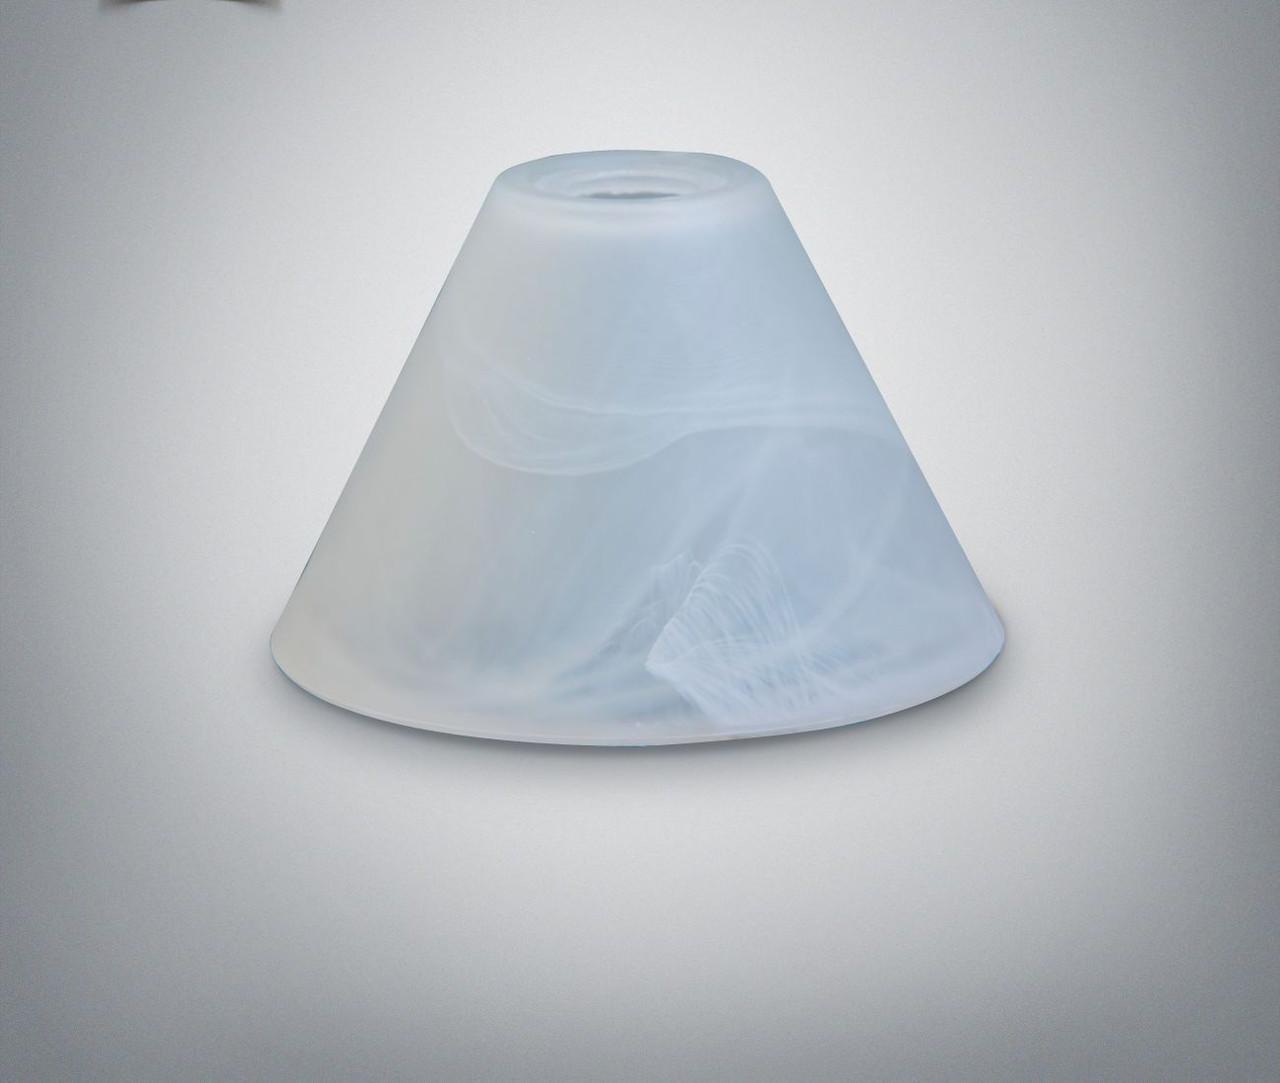 Плафон конус 15,5 белый, цоколь Е14